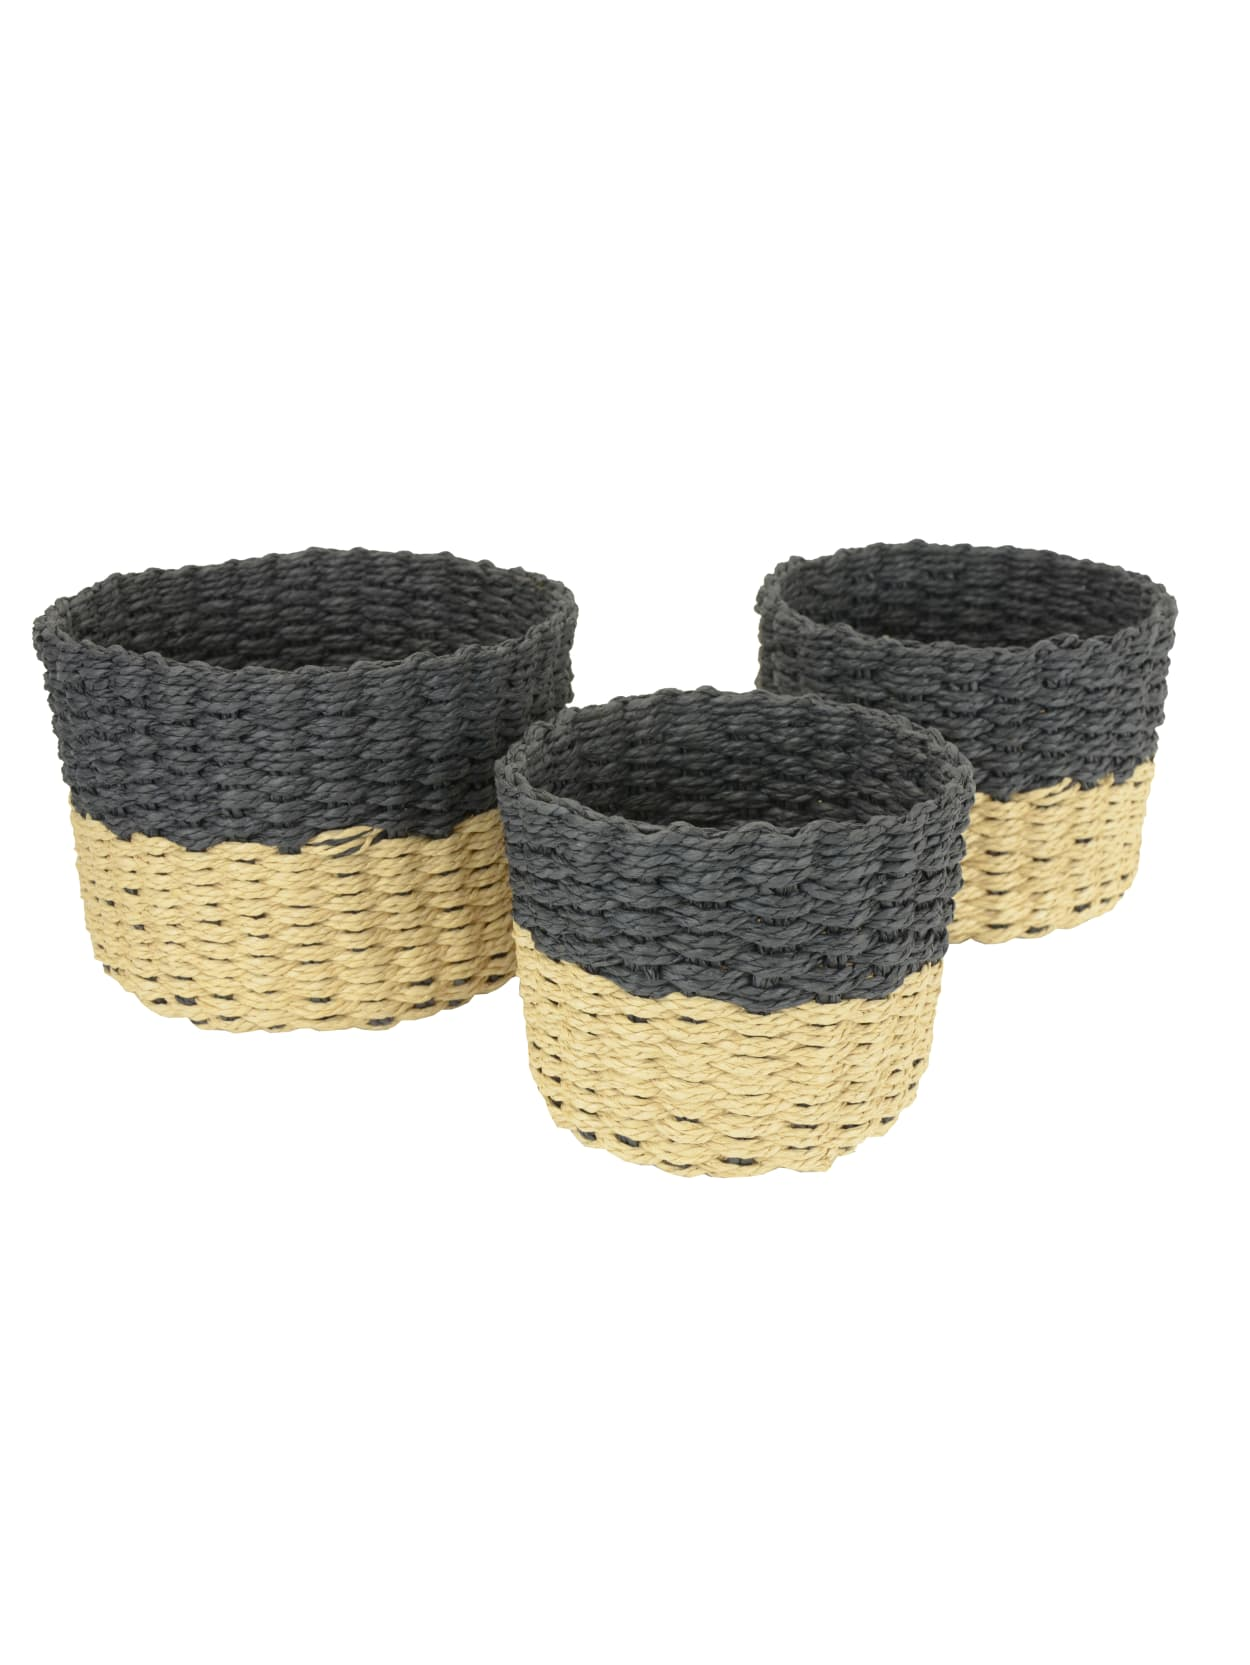 Gnbi 3 Piece Round Basket Set Blacknatural Office Depot